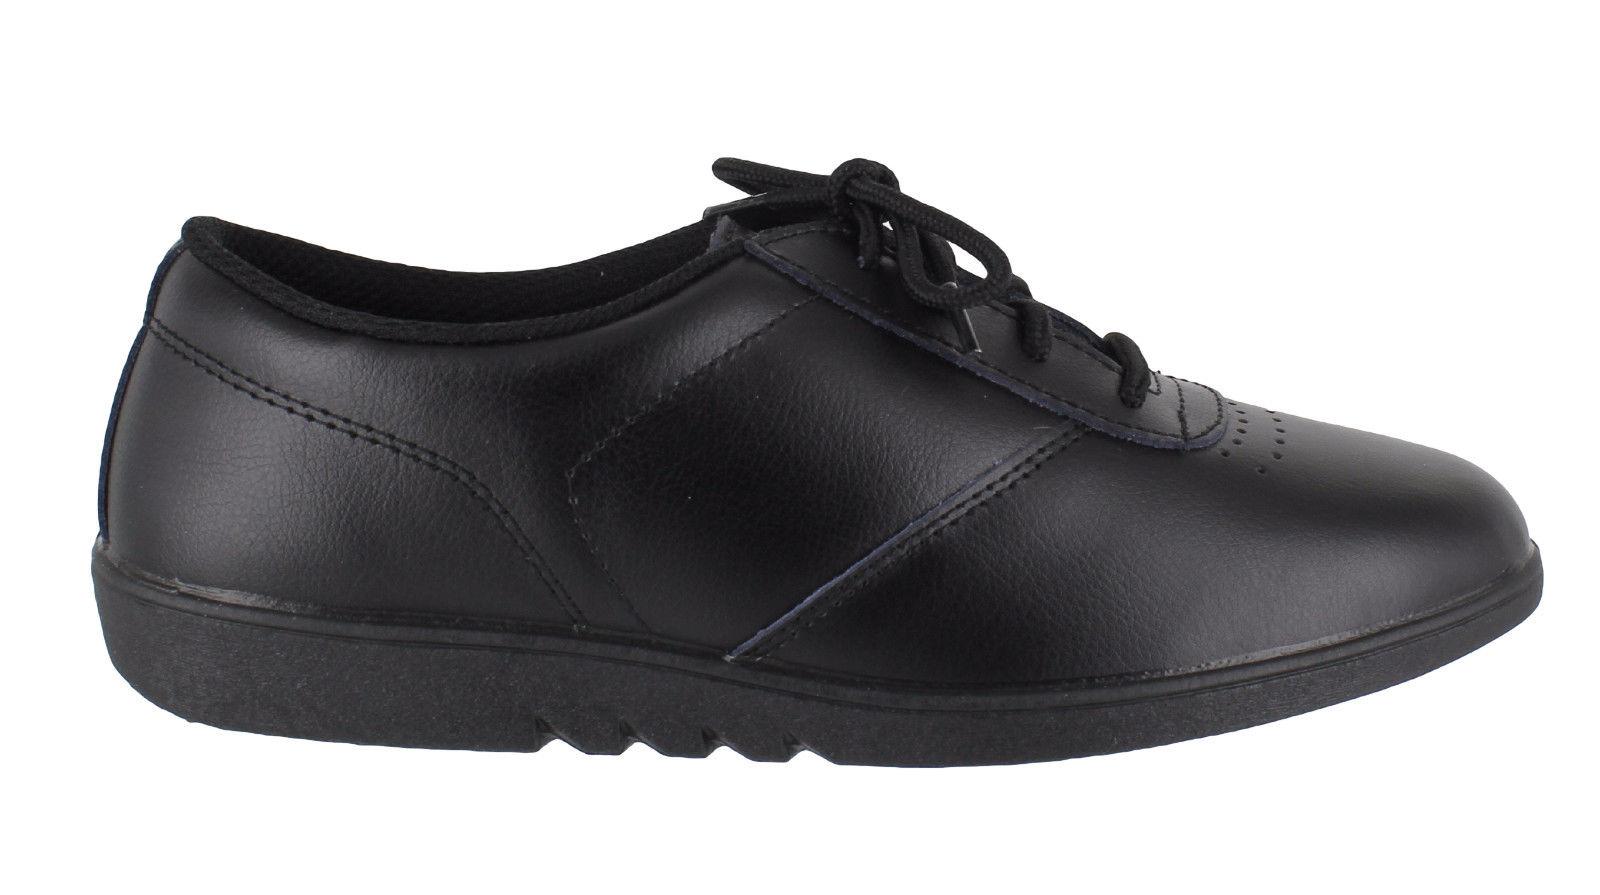 83a91c4de969 Womens Comfort Treble Leather Lace Up Washable Flat Sole Shoes Sizes 3 to 9